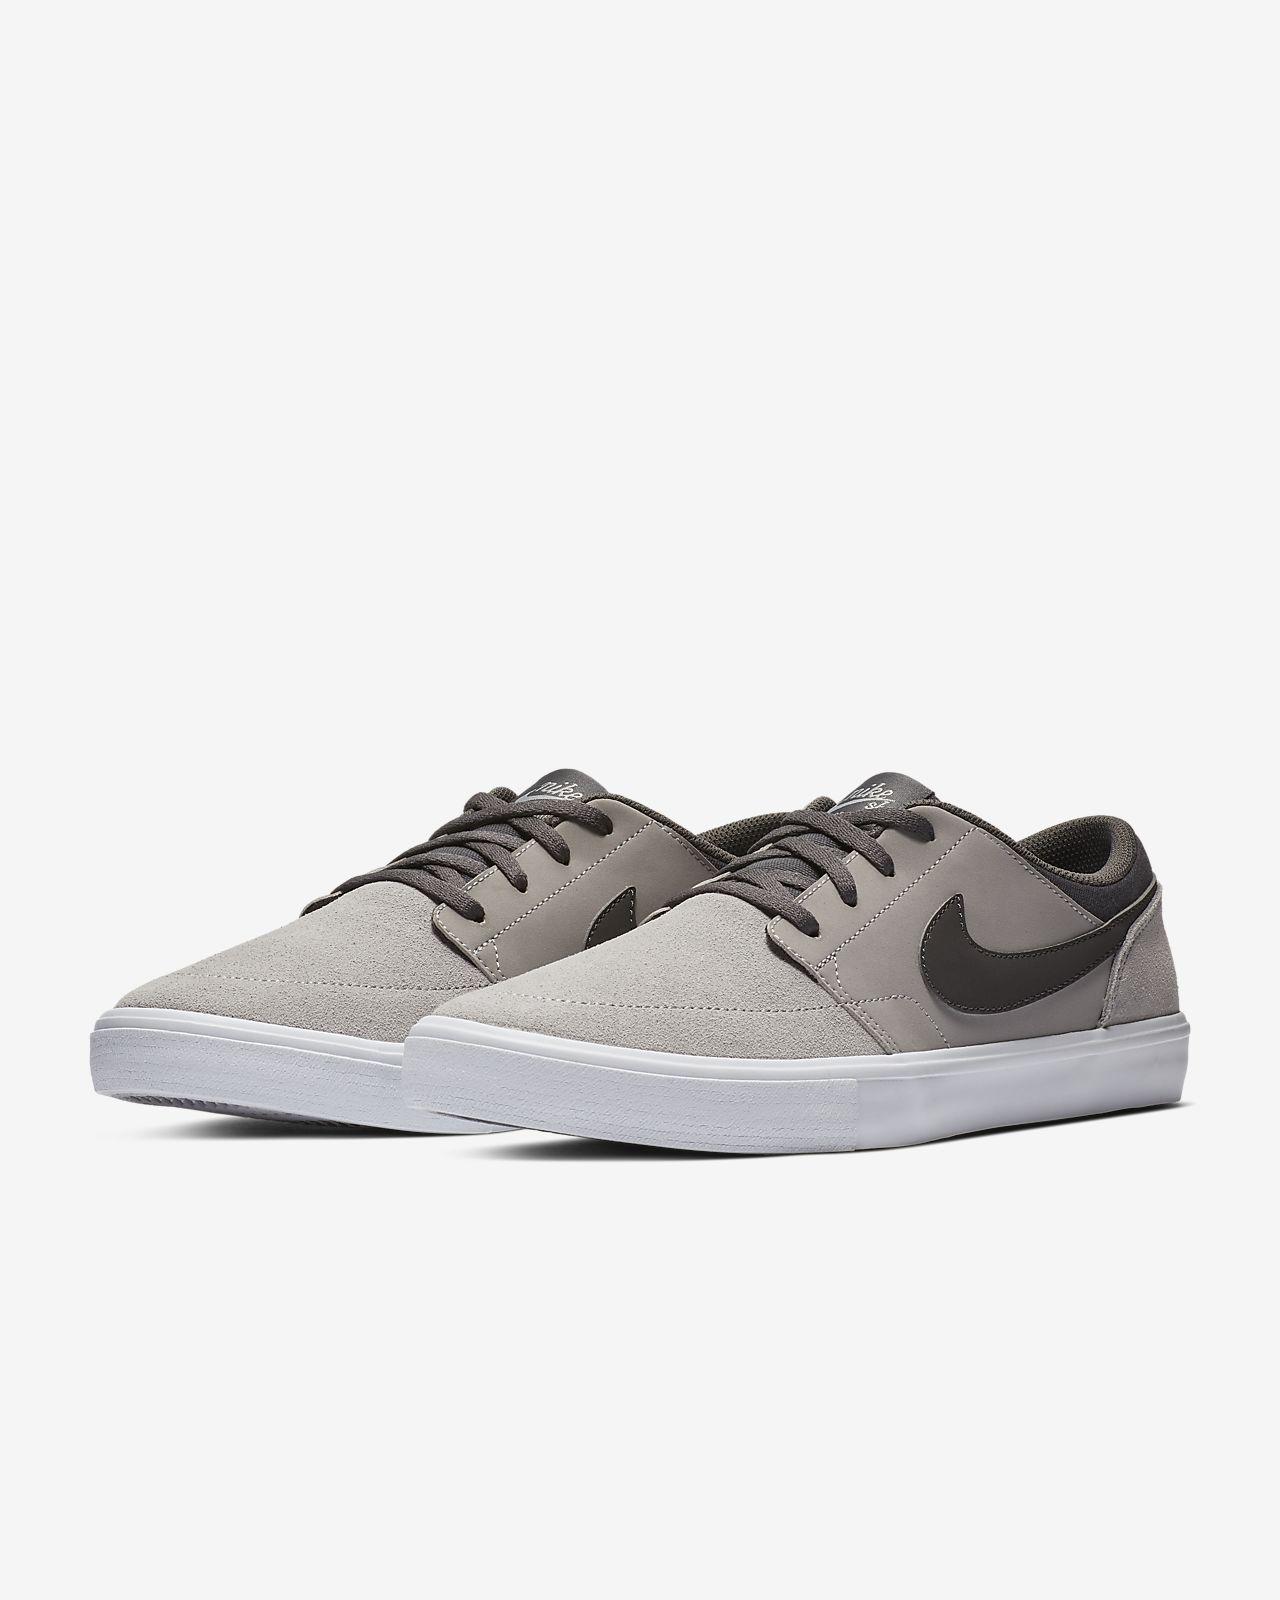 brand new b7d1a fcfe2 ... Chaussure de skateboard Nike SB Solarsoft Portmore II pour Homme